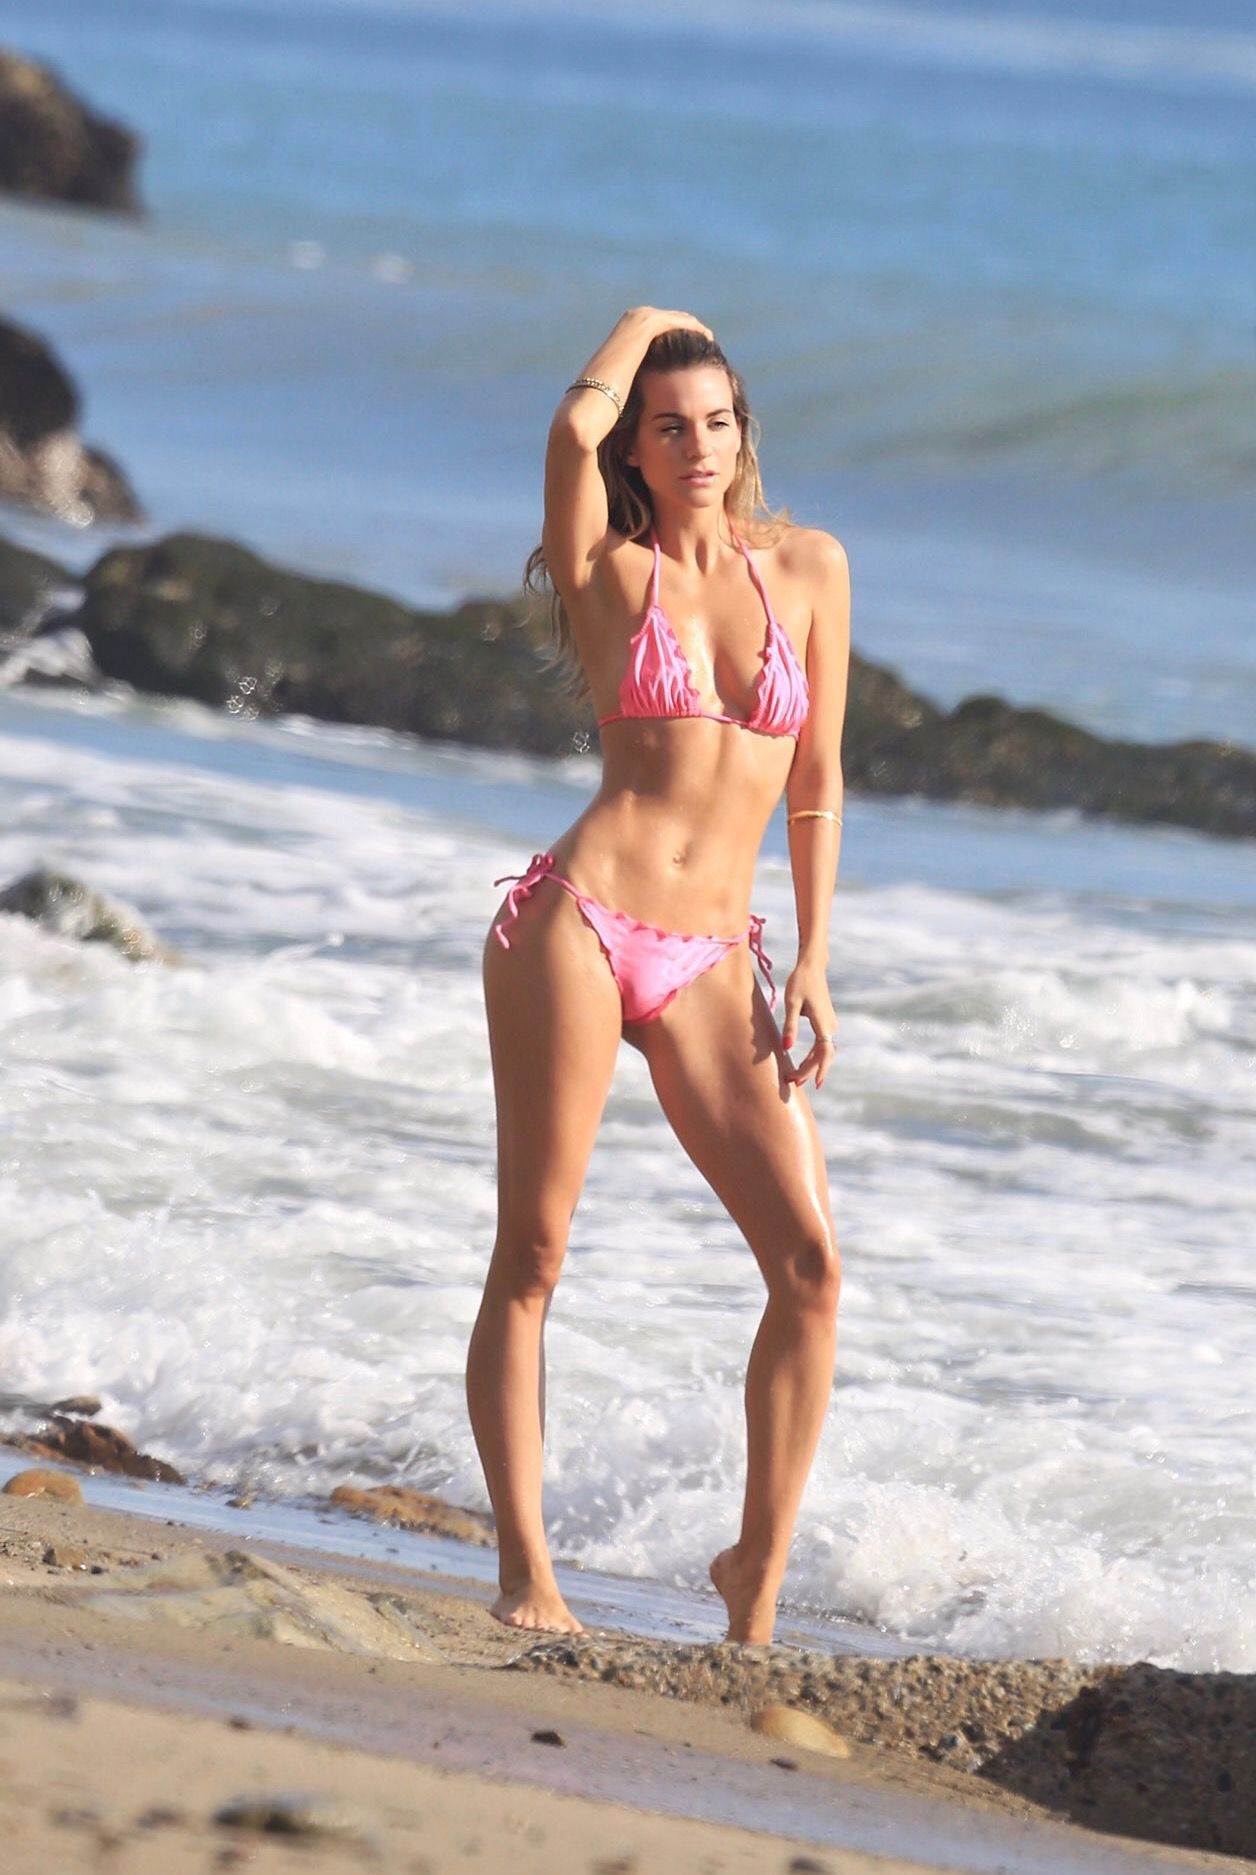 2019 Rachel McCord nudes (68 photo), Topless, Cleavage, Boobs, cleavage 2015